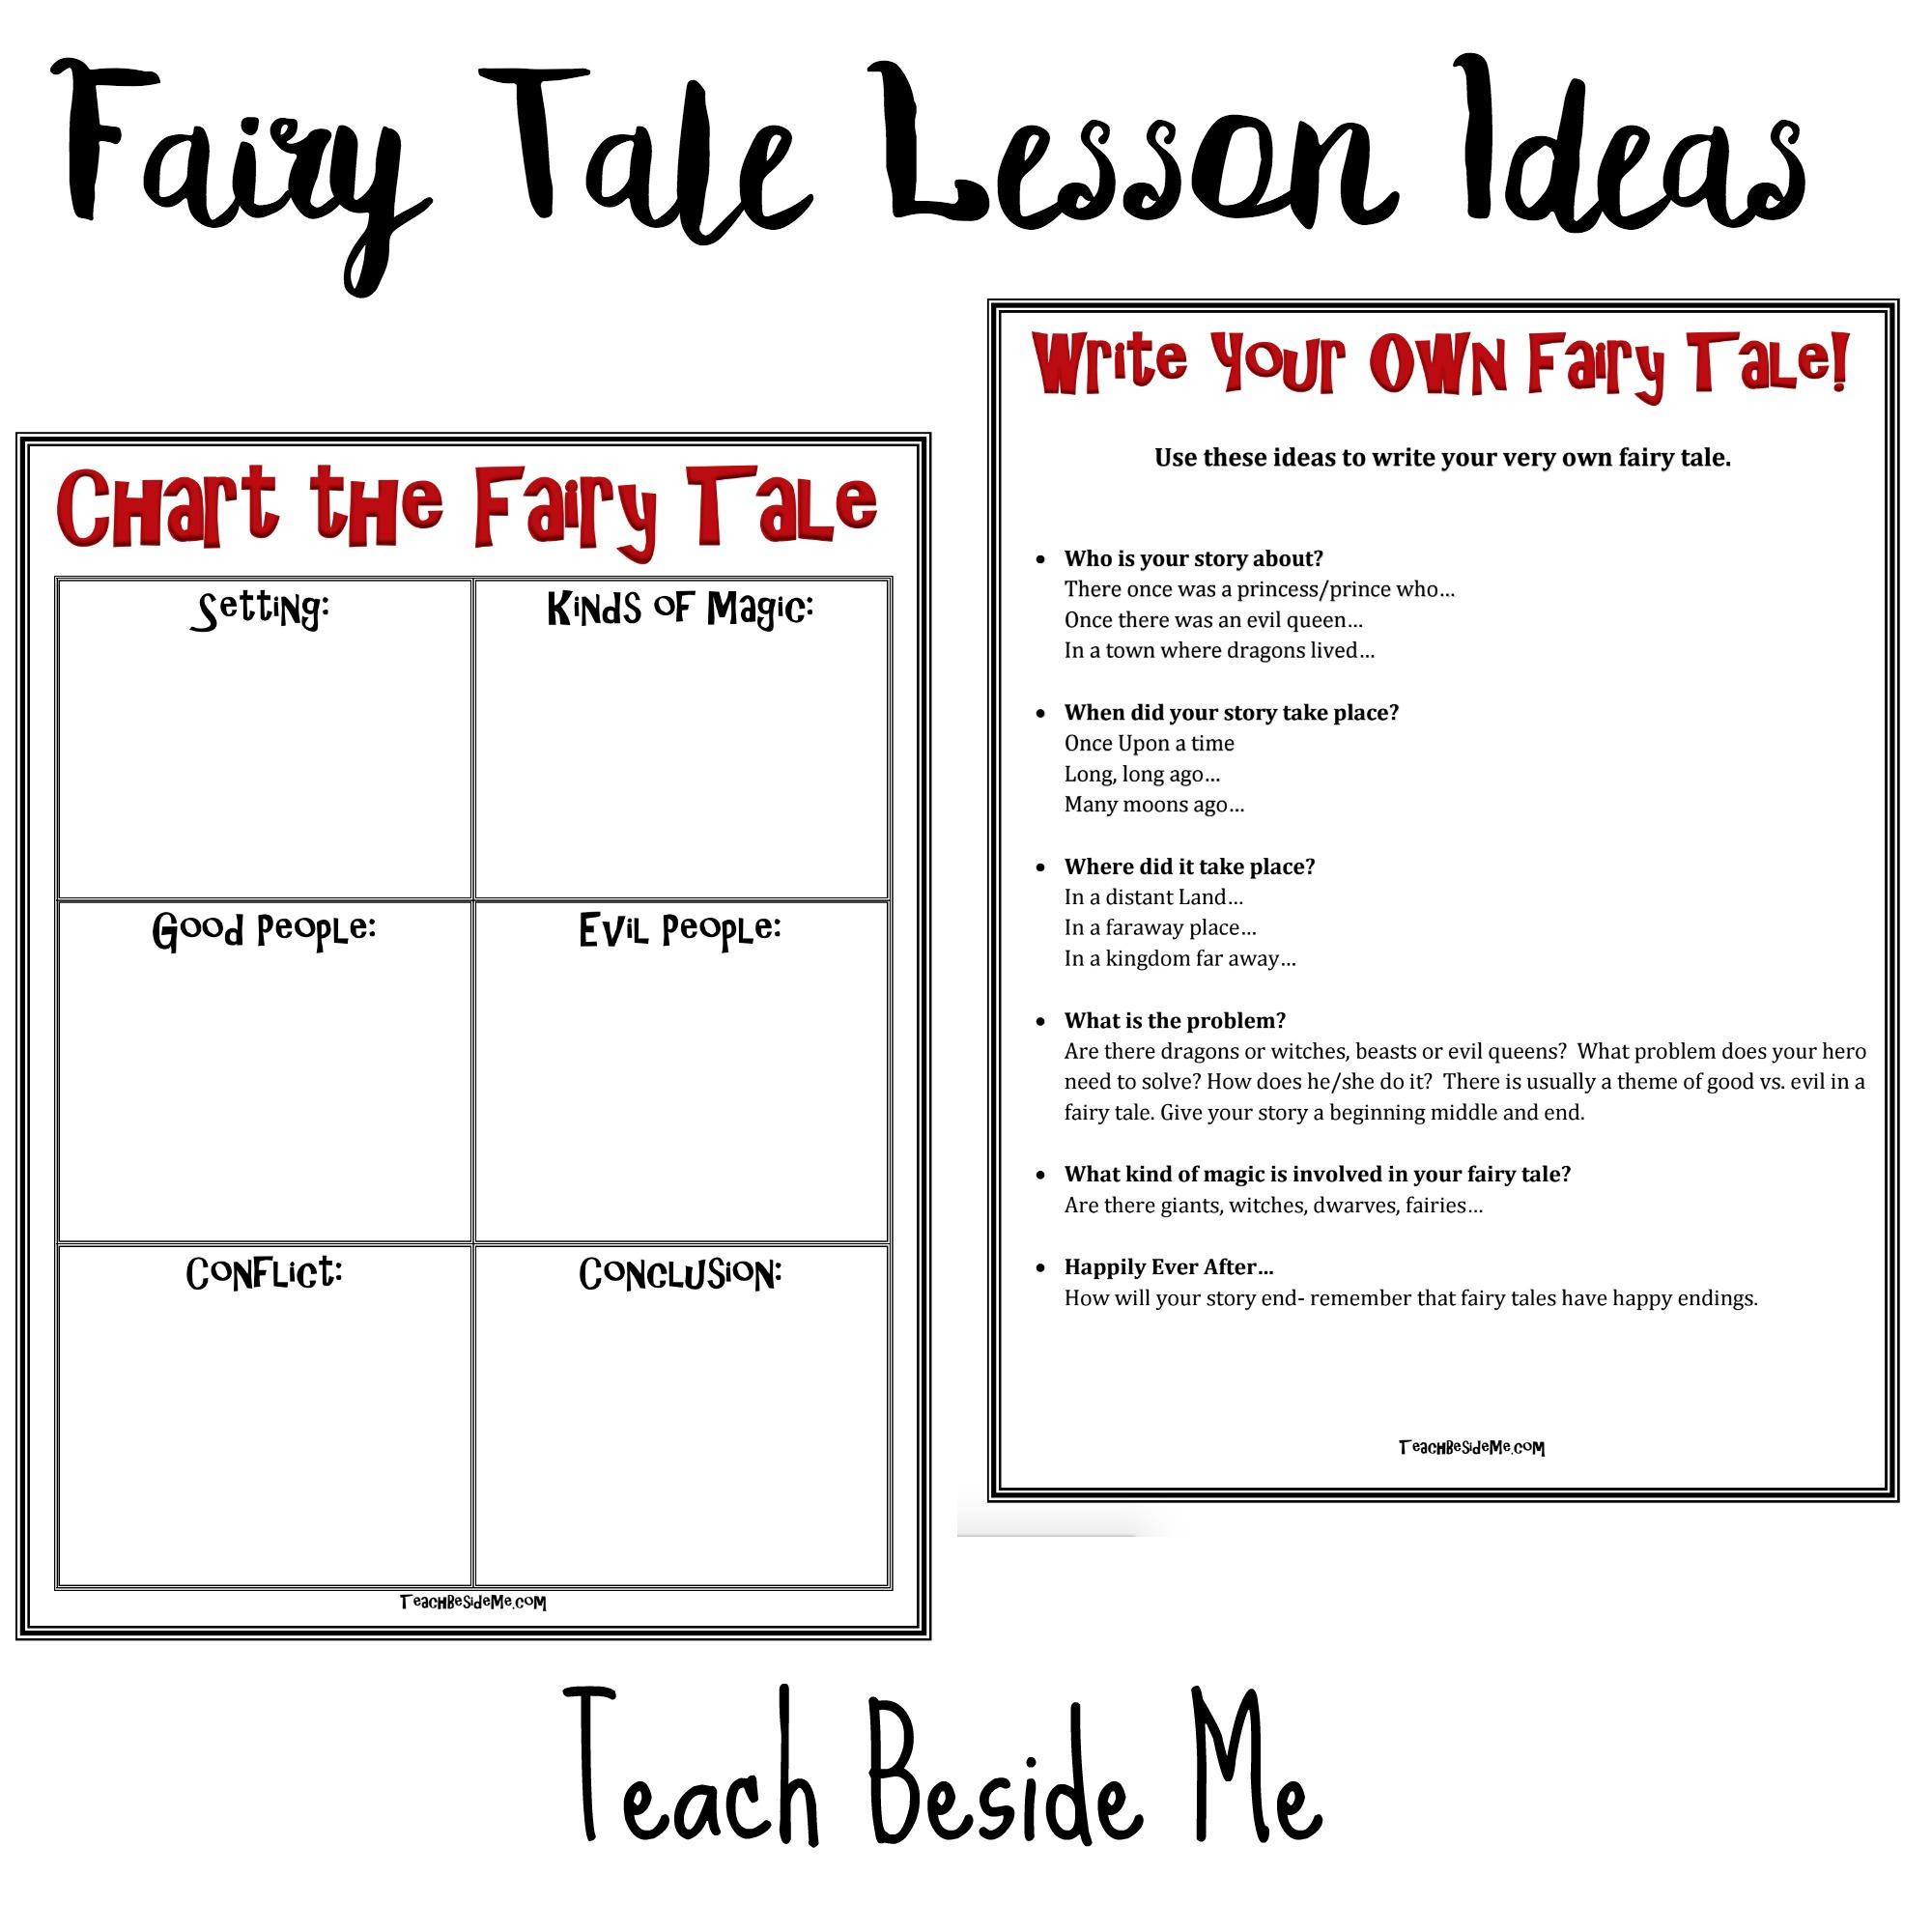 Hans christian anderson fairy tale lesson teach beside me hans christian anderson fairy tale lesson publicscrutiny Choice Image